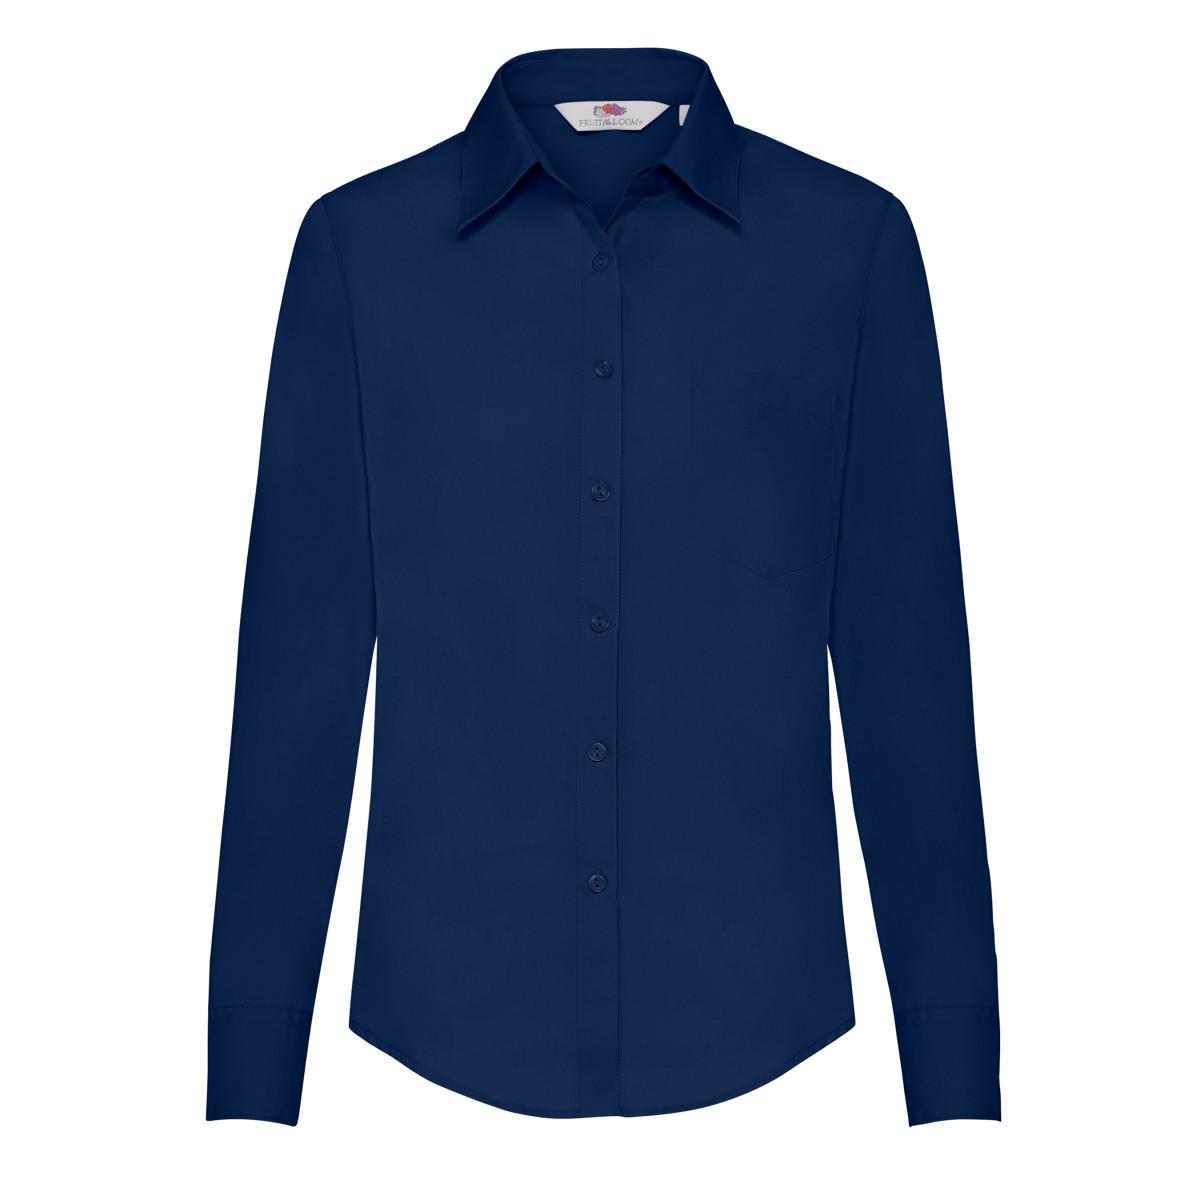 Lady-Fit Long Sleeve Poplin Shirt